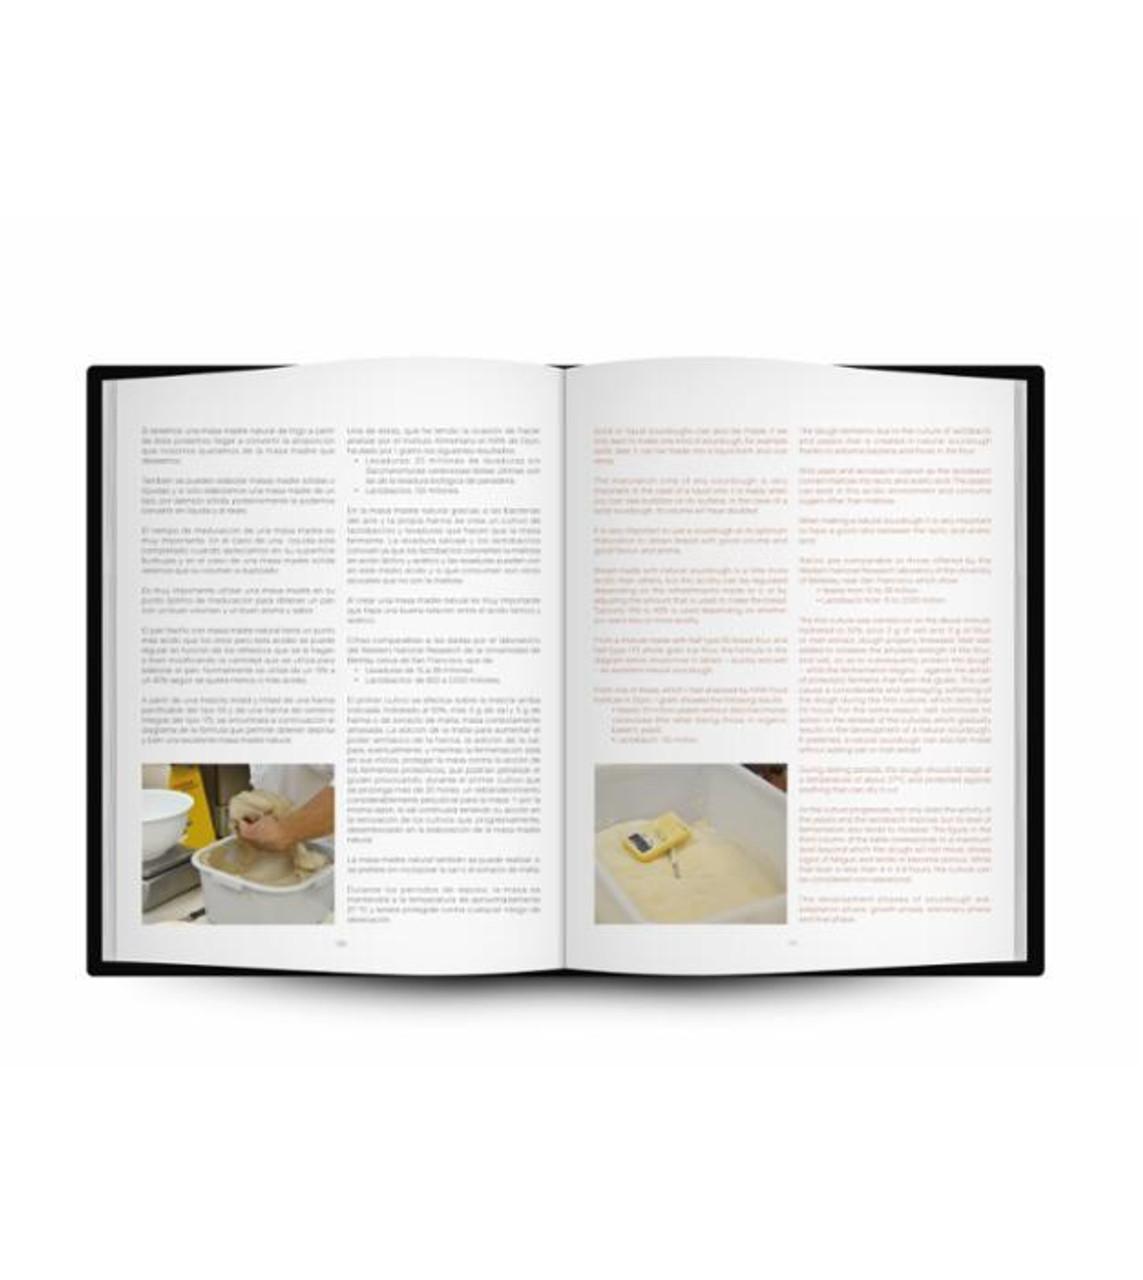 Process & Utilities - Sourdough